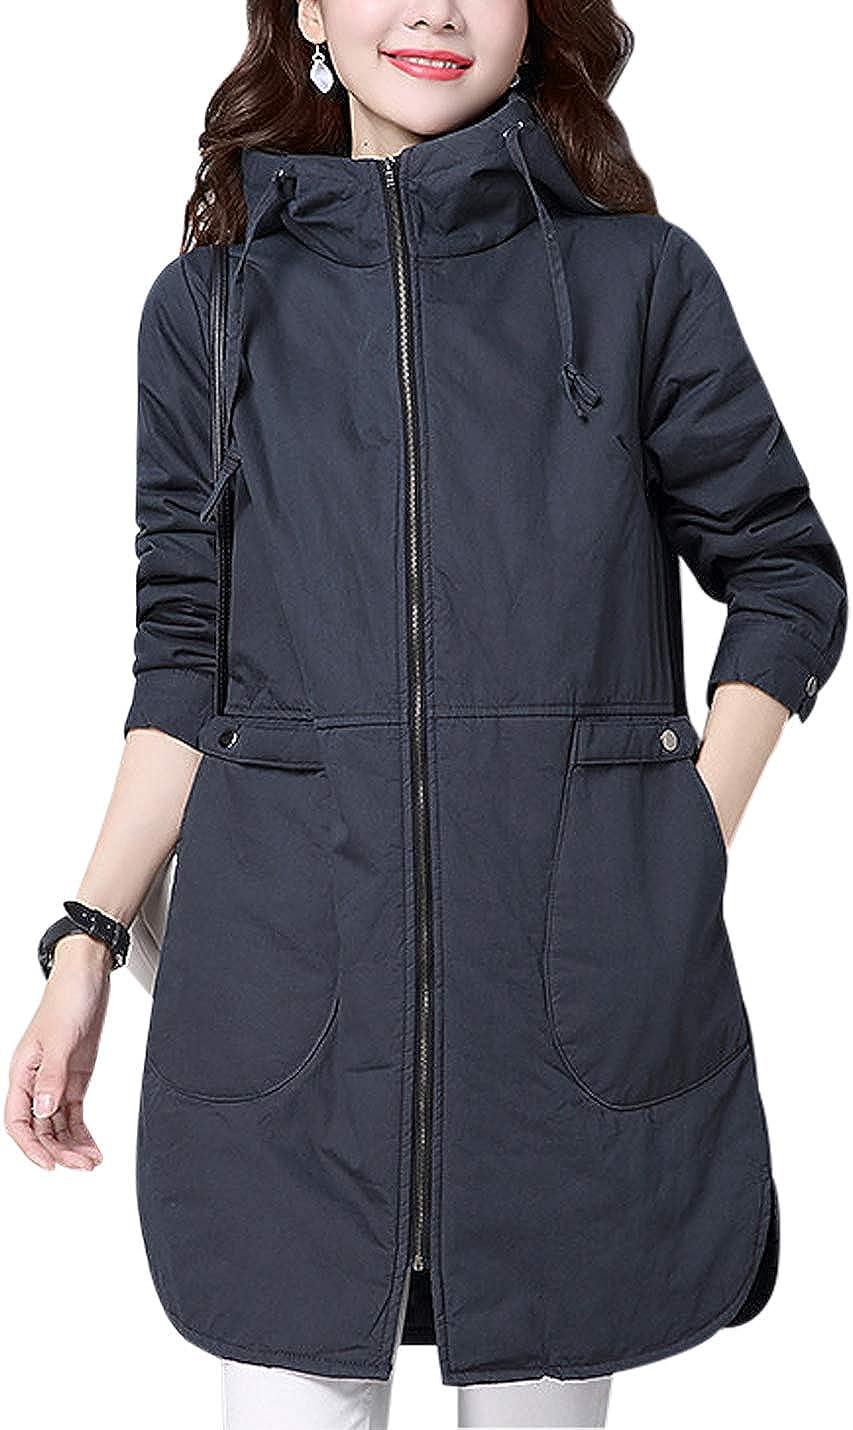 Jenkoon Women's Diamond Quilted Jacket Parka Overcoat with Fur Hood